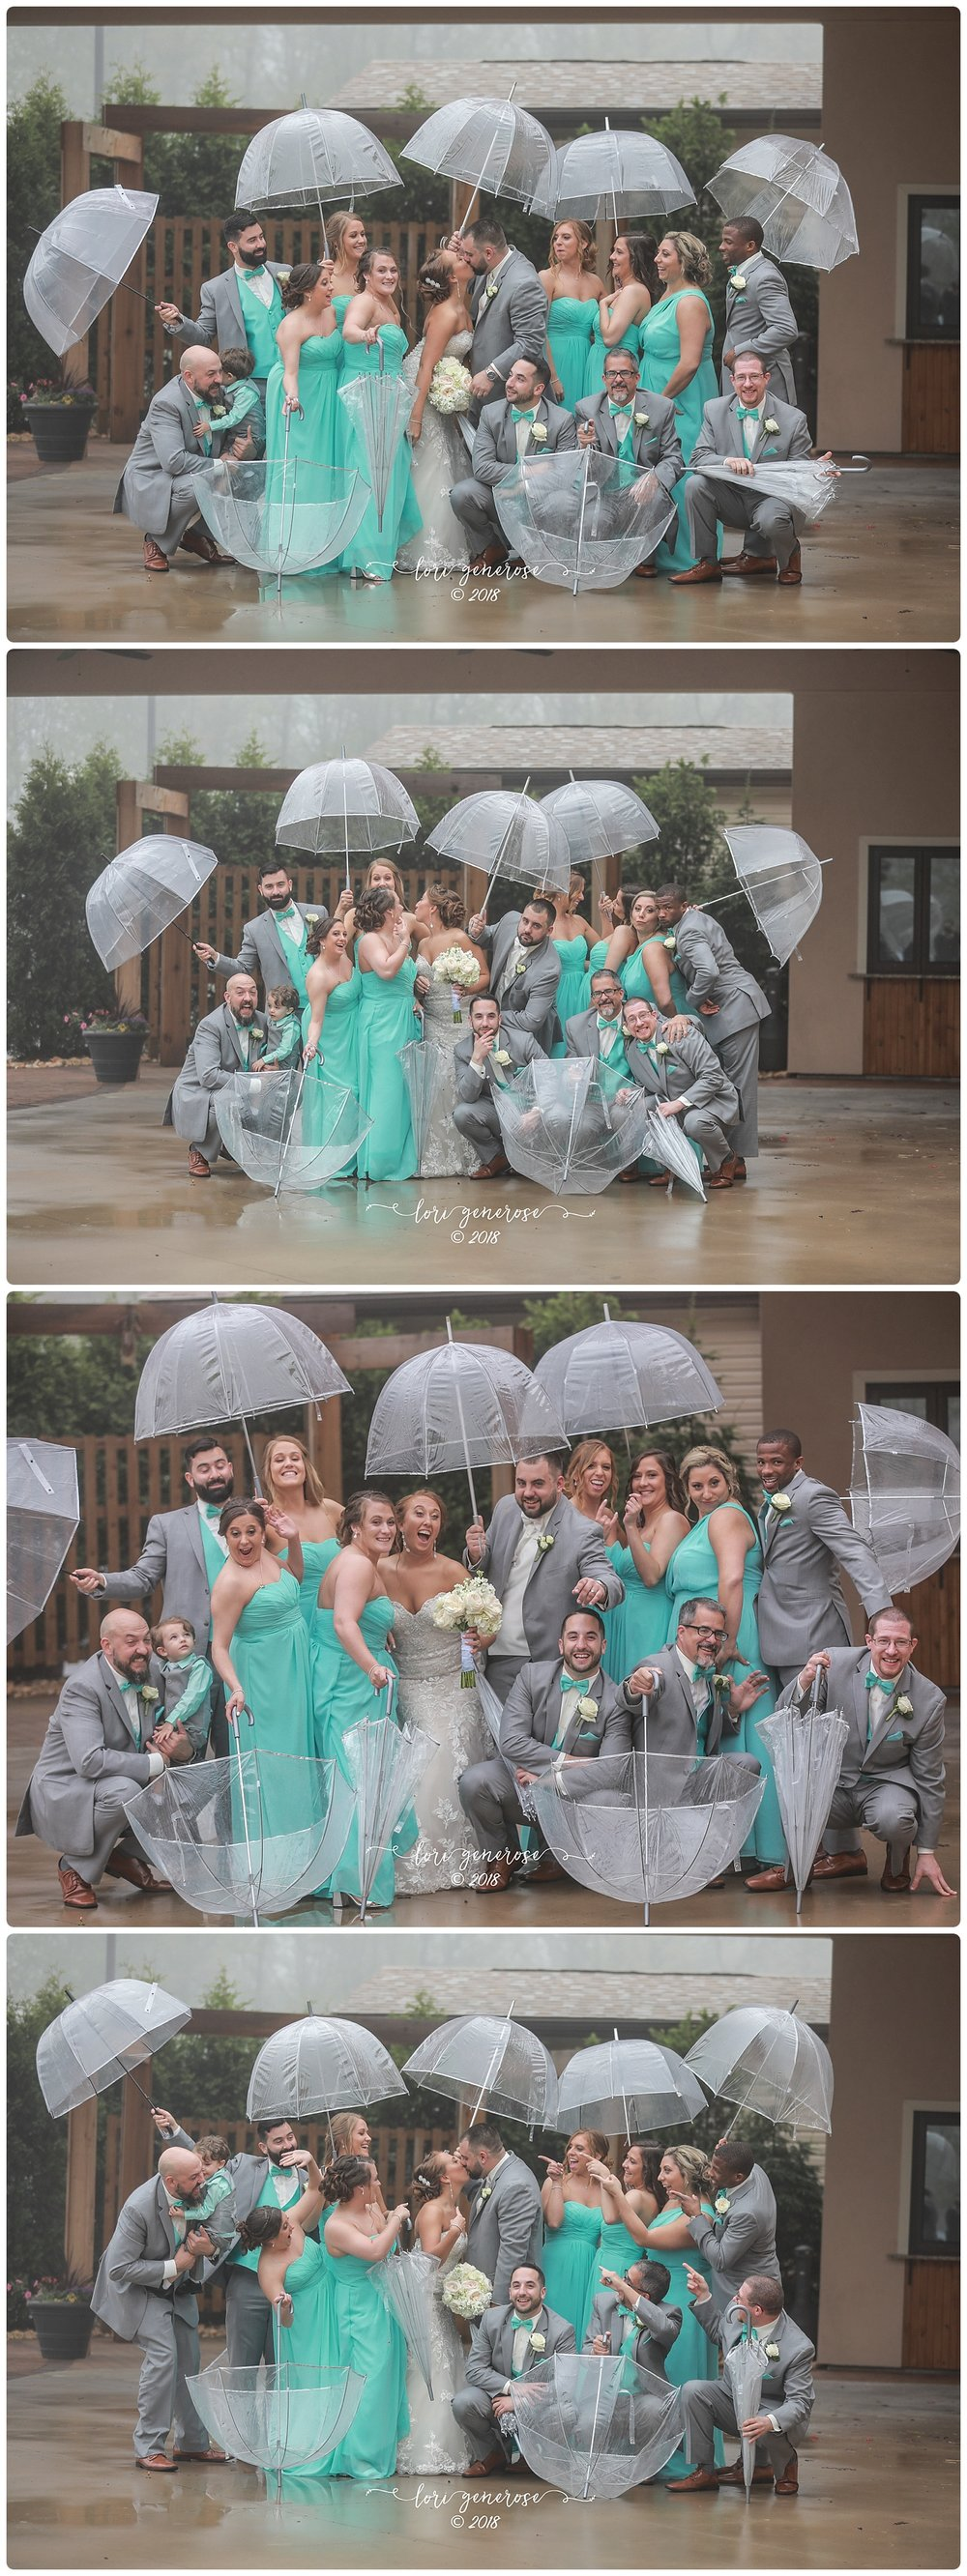 lgphotographylorigeneroseweddingbridalpartywithumbrellasrainydaywedding.jpg